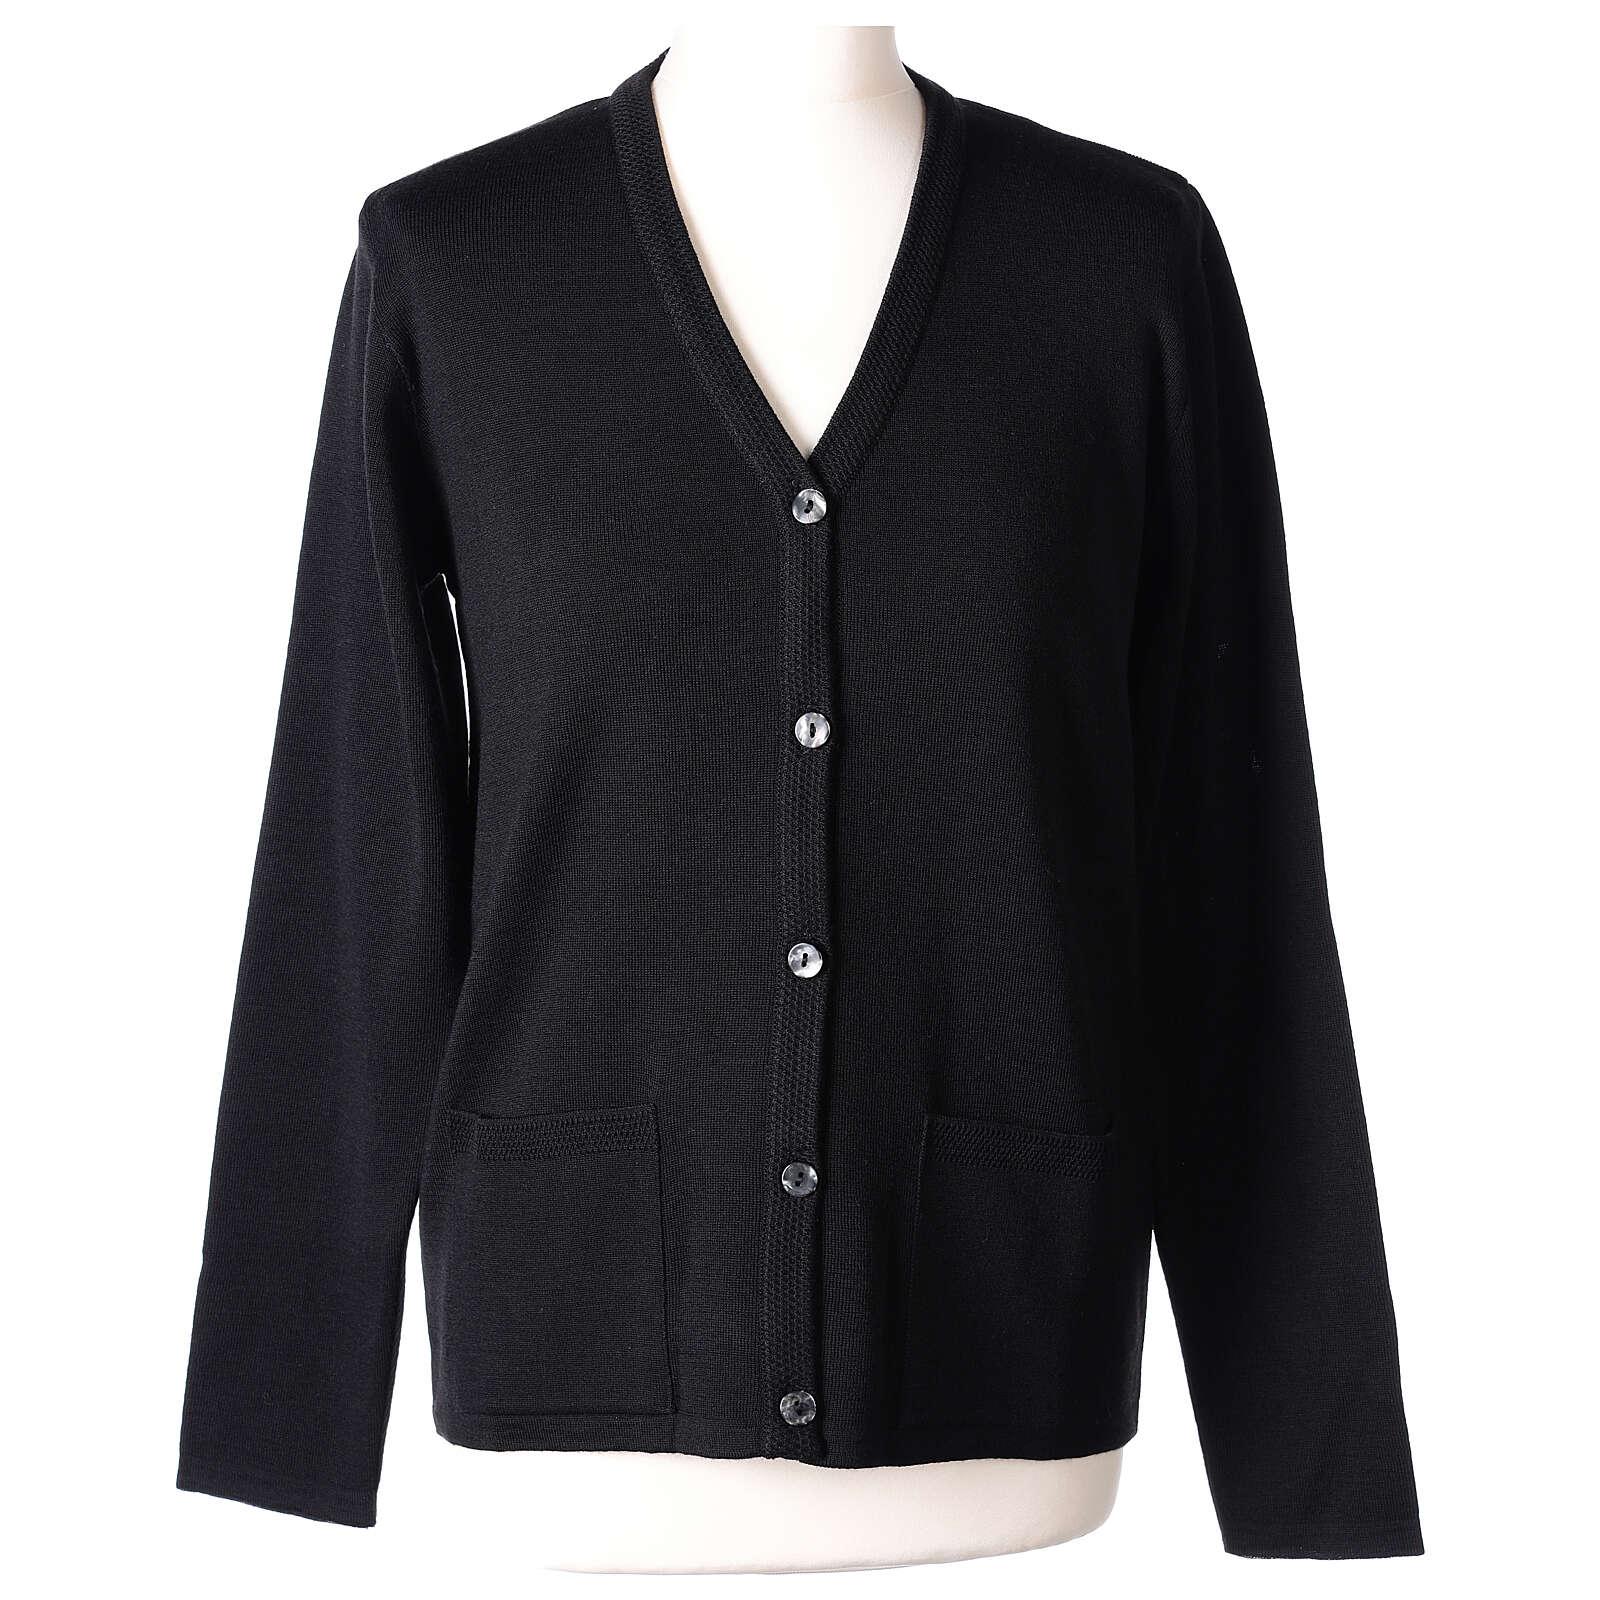 Rebeca monja negra cuello V bolsillos punto unido 50% acrílico 50% lana merina In Primis 4